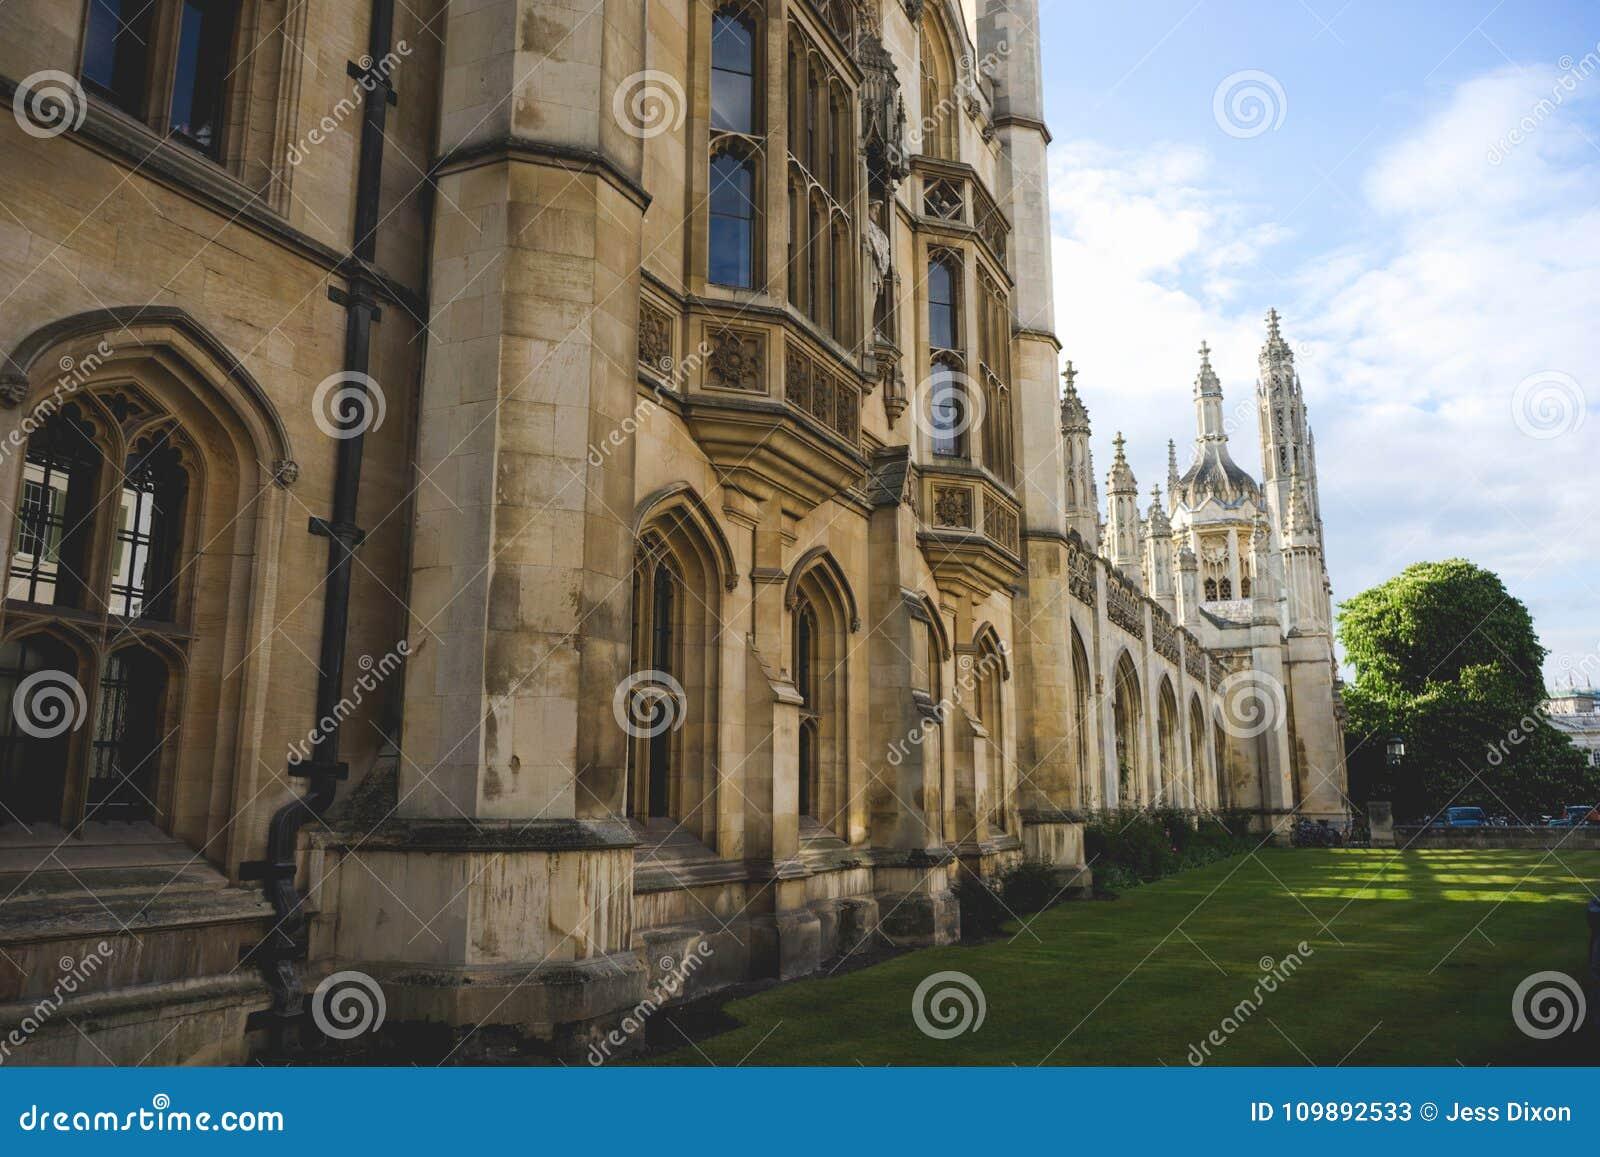 Kings College, Cambridge University Building, England